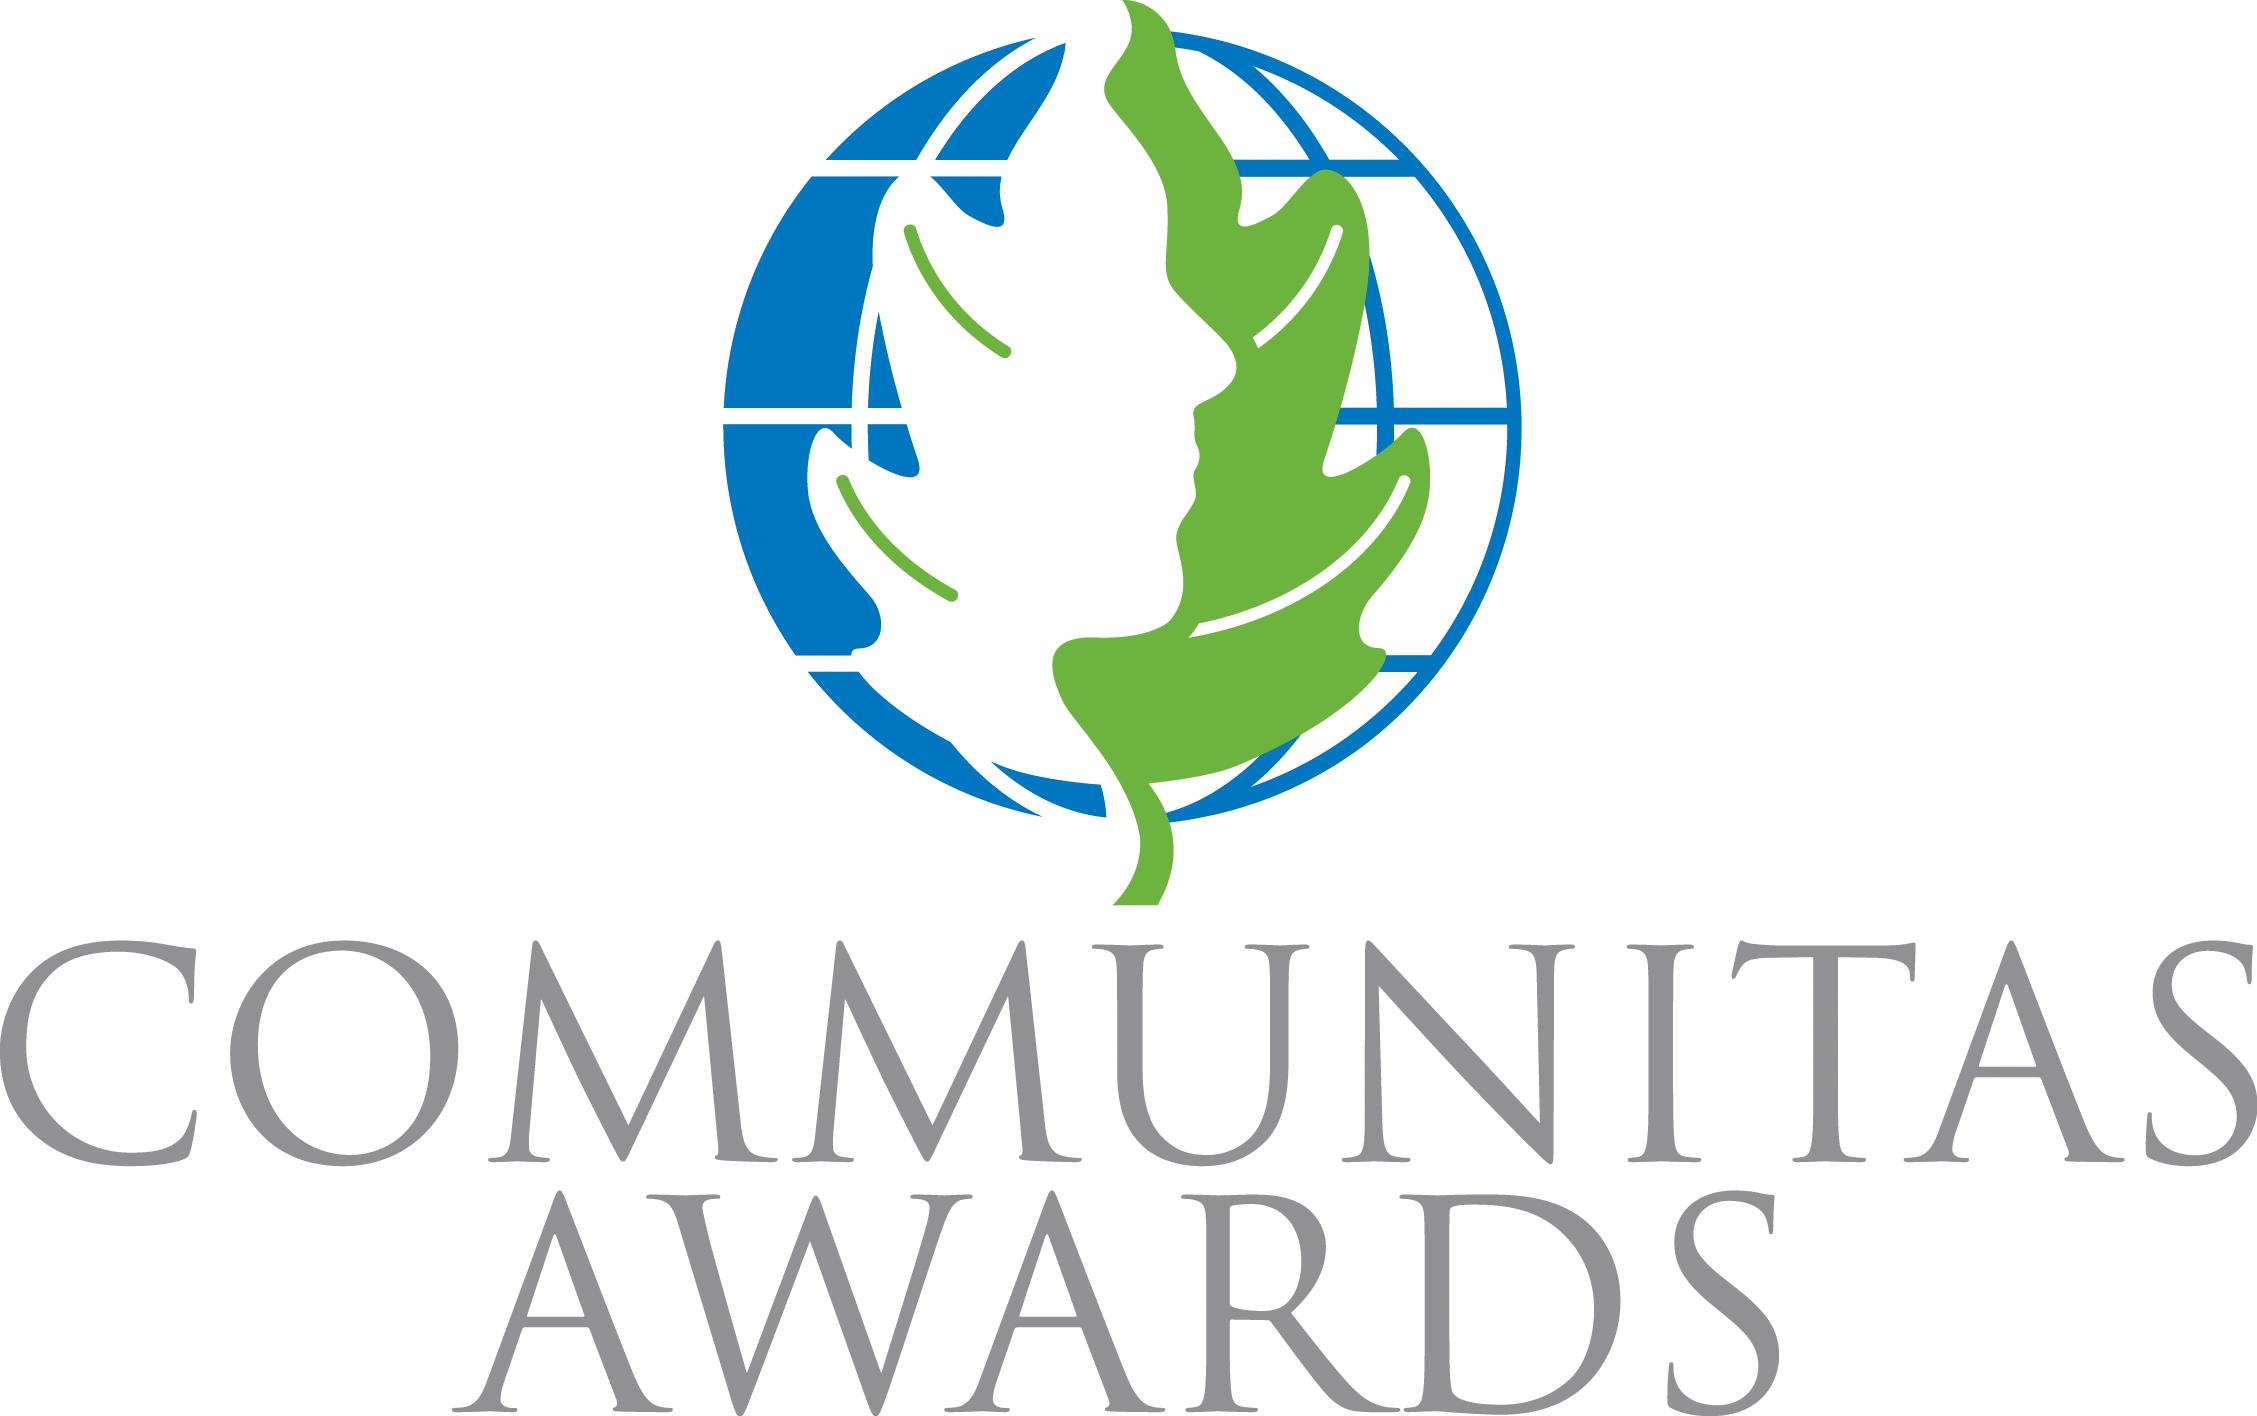 Communitas Awards